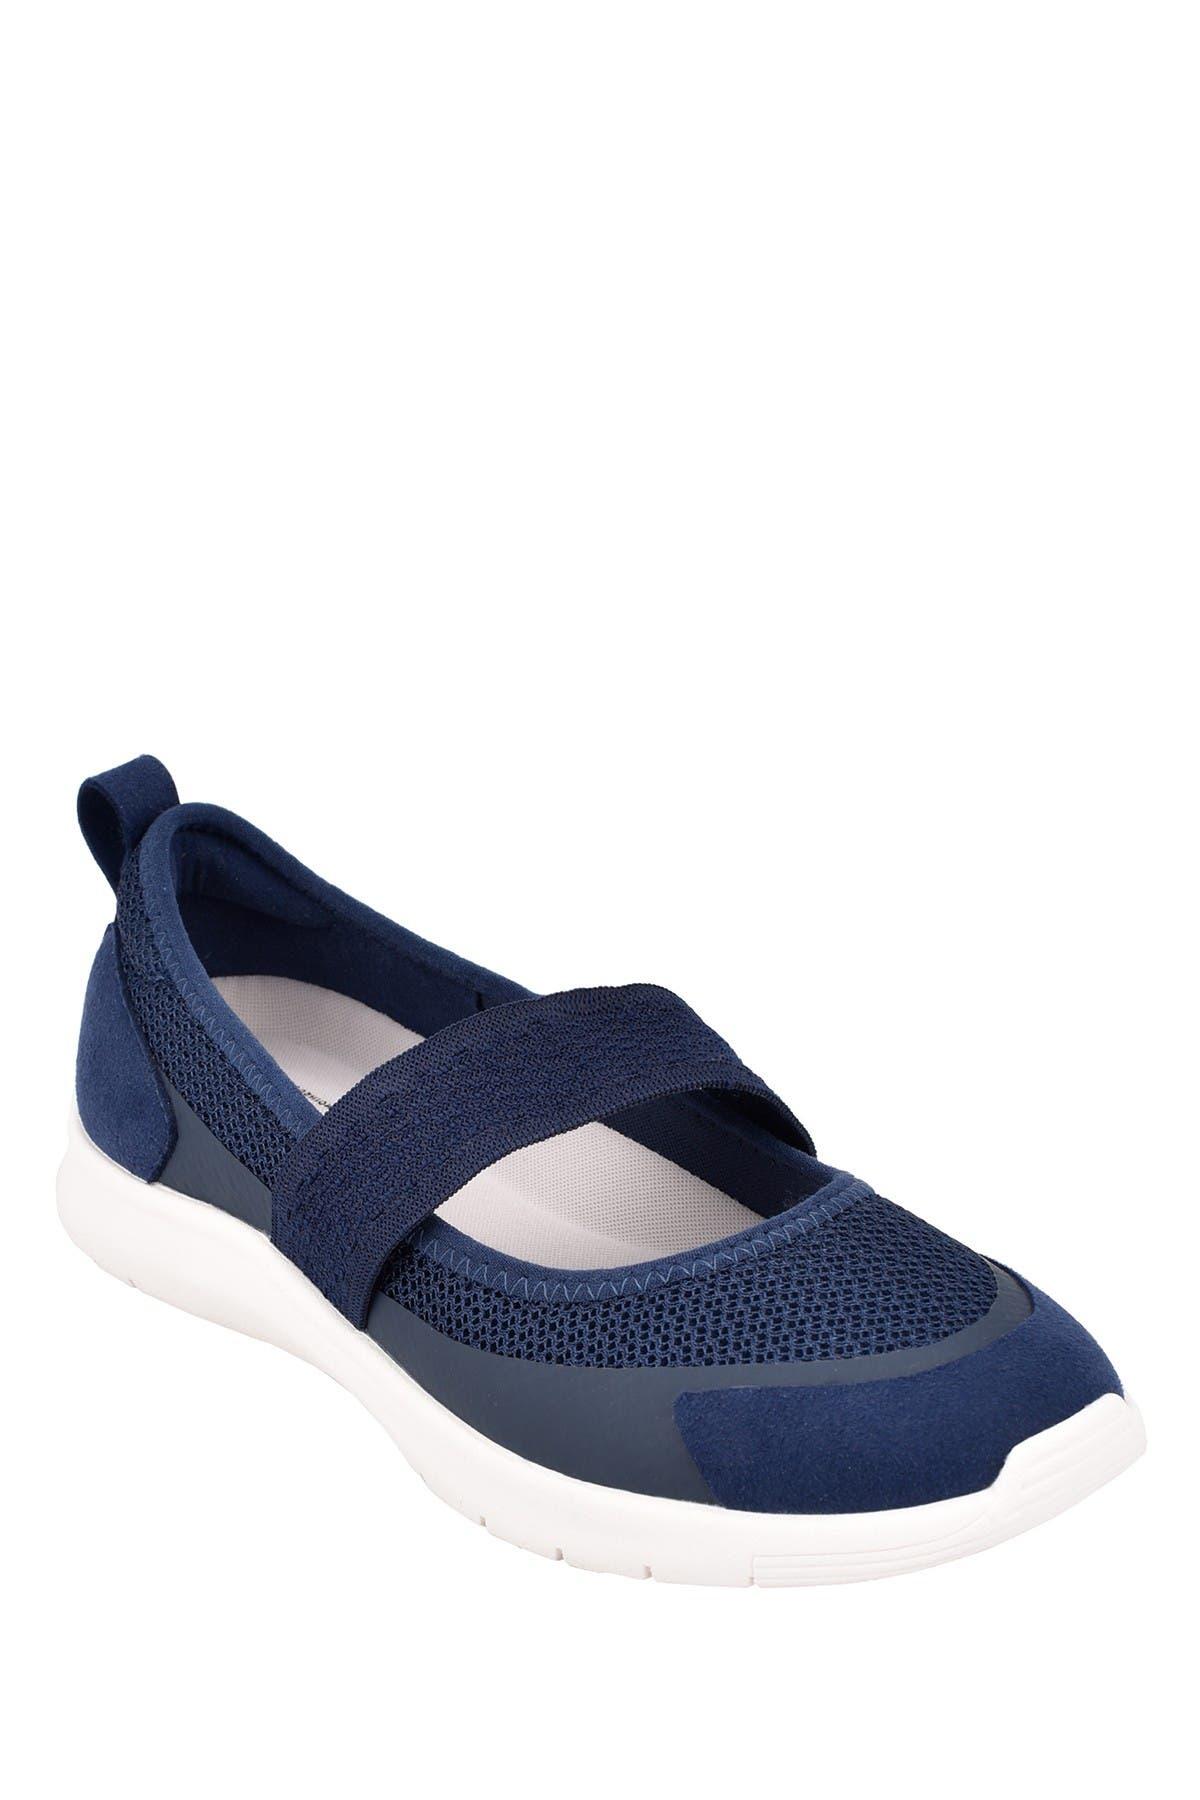 Easy Spirit | Gear 2 Mary Jane Sneaker